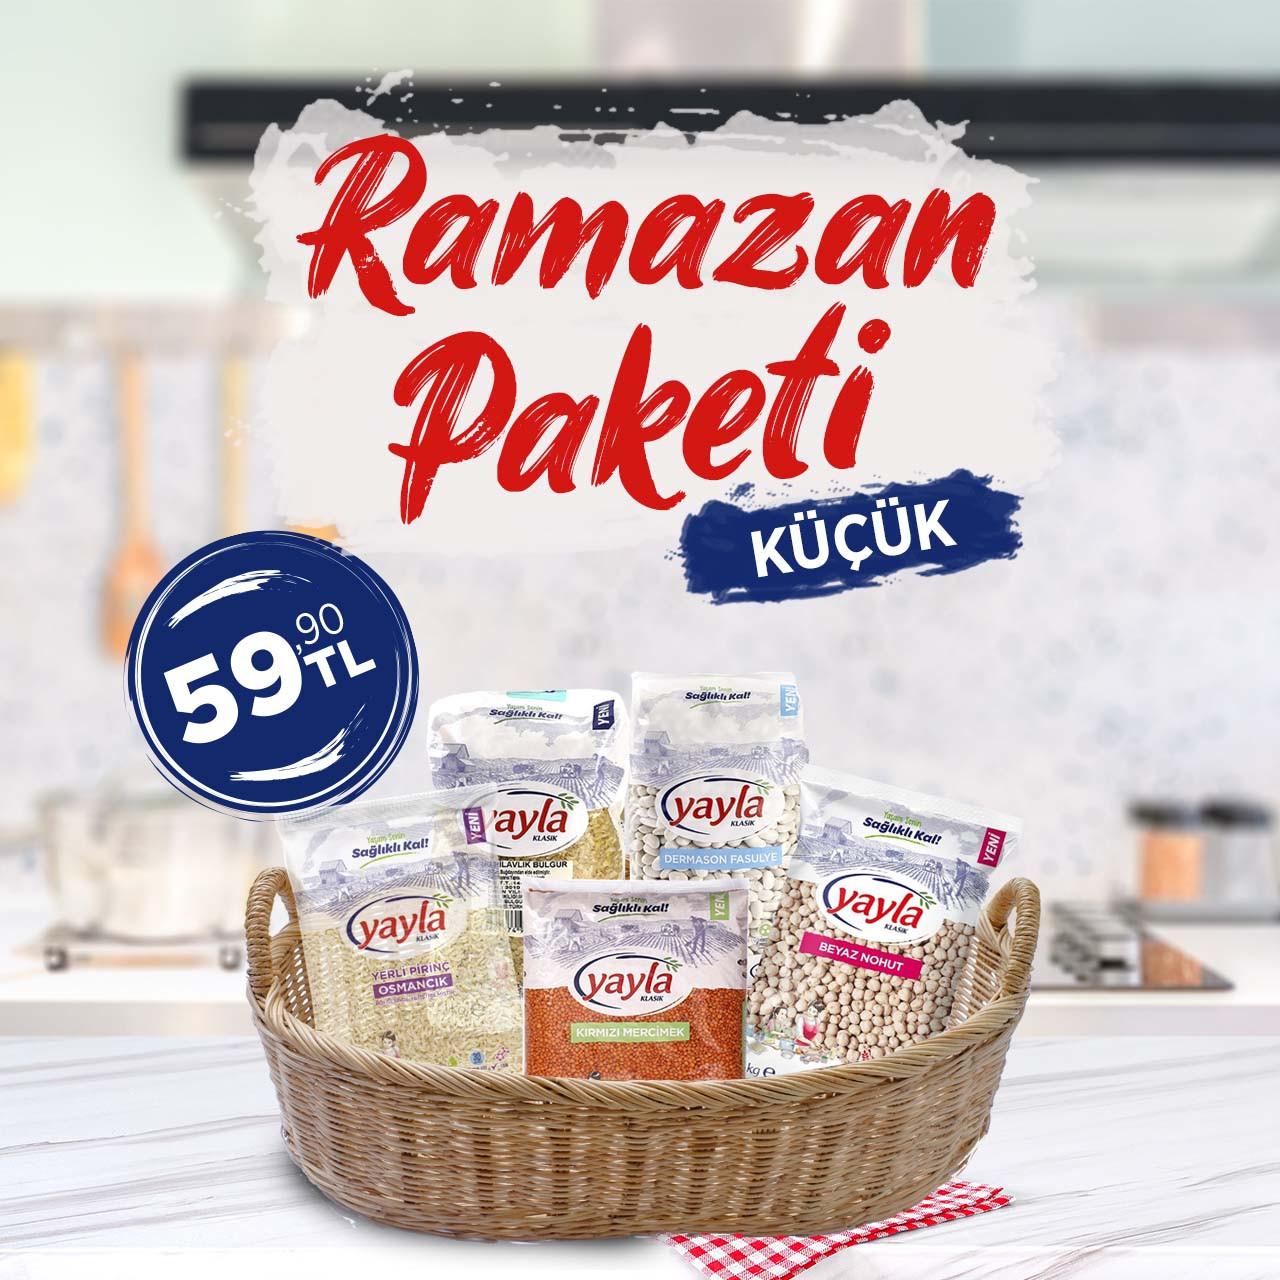 Ramazan Paketi Küçük